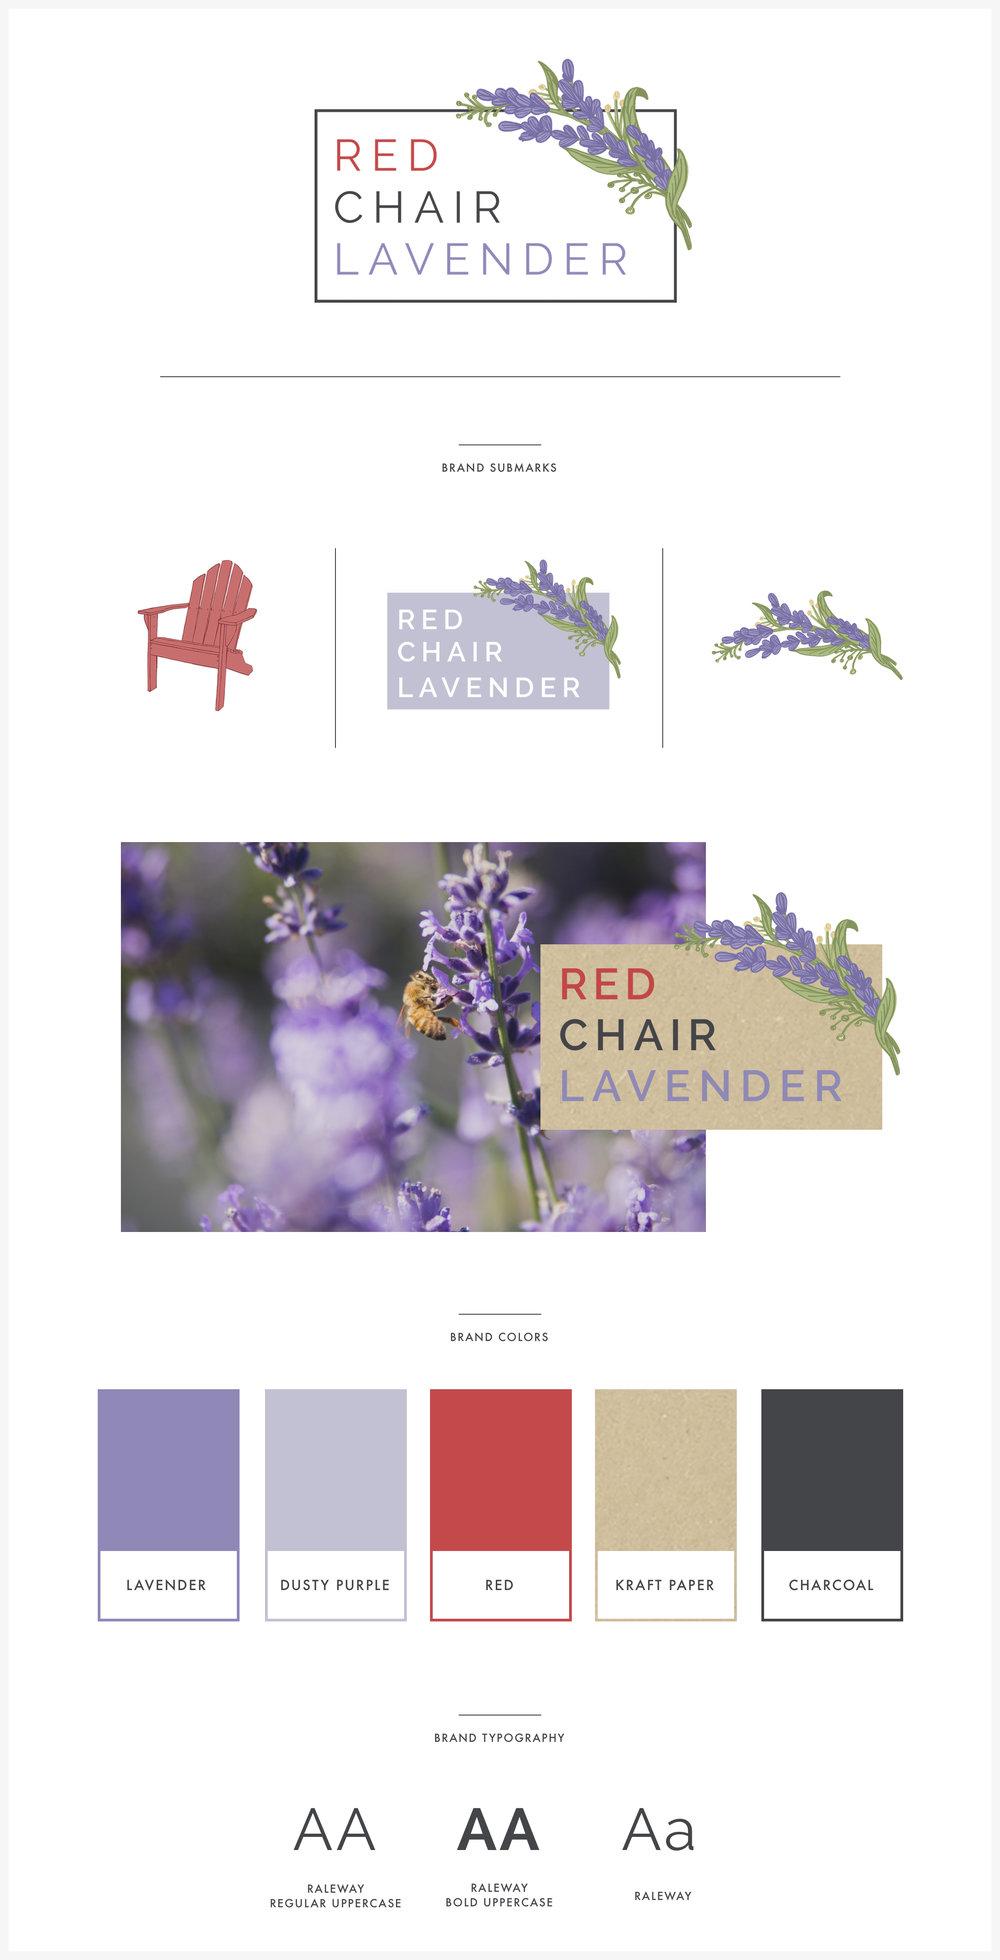 red-chair-lavender-ekd.jpg